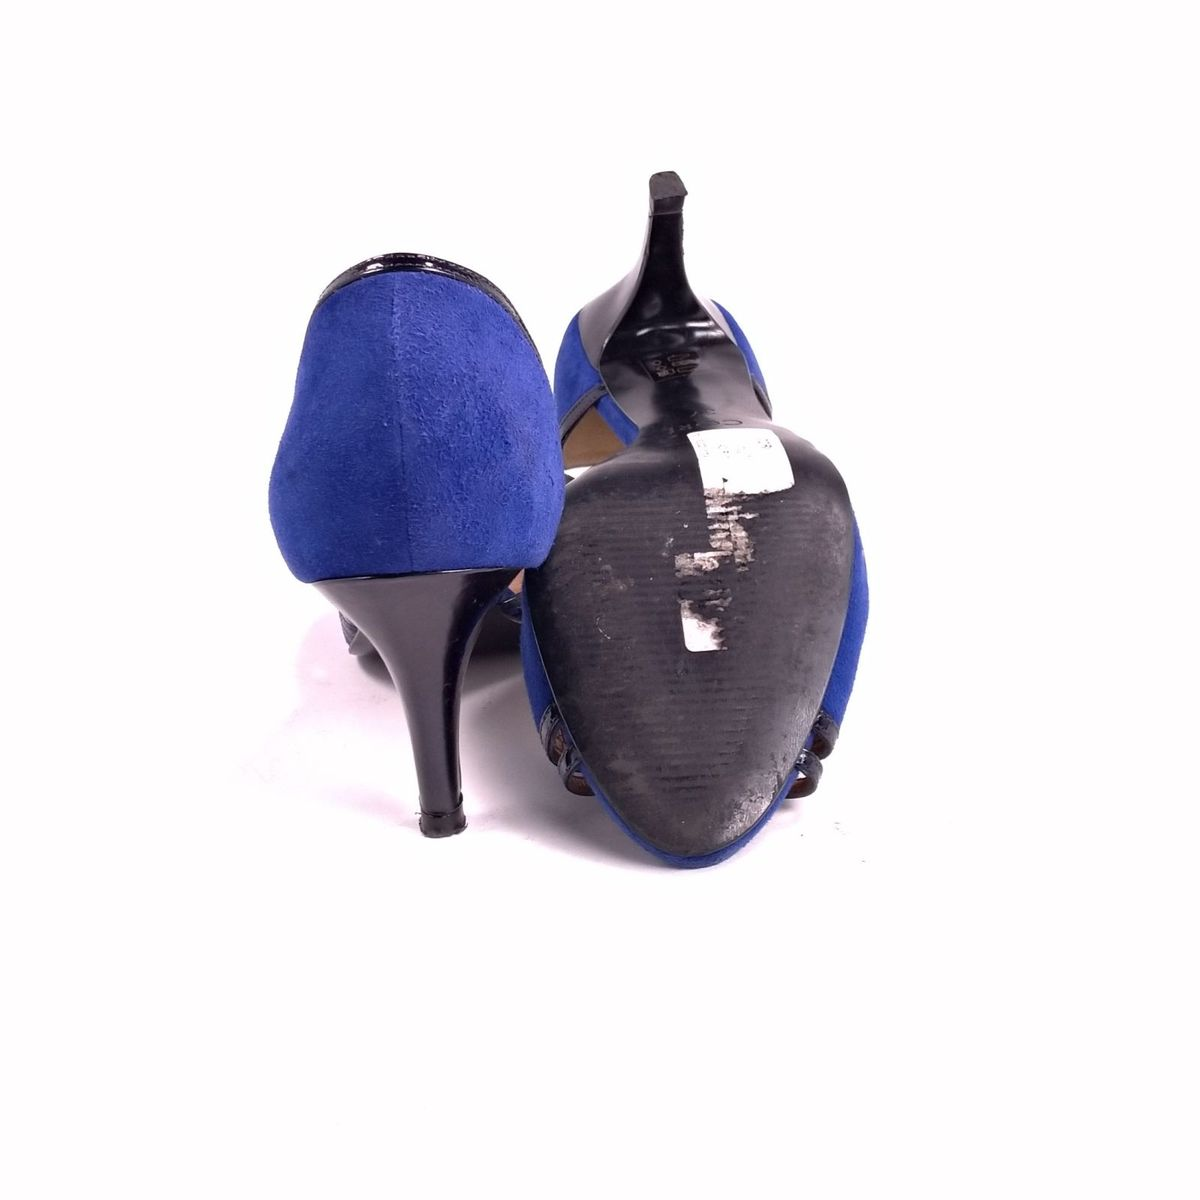 582ac57372 Sapato Duas Cores Cori | Sapato Feminino Cori Usado 32104442 | enjoei